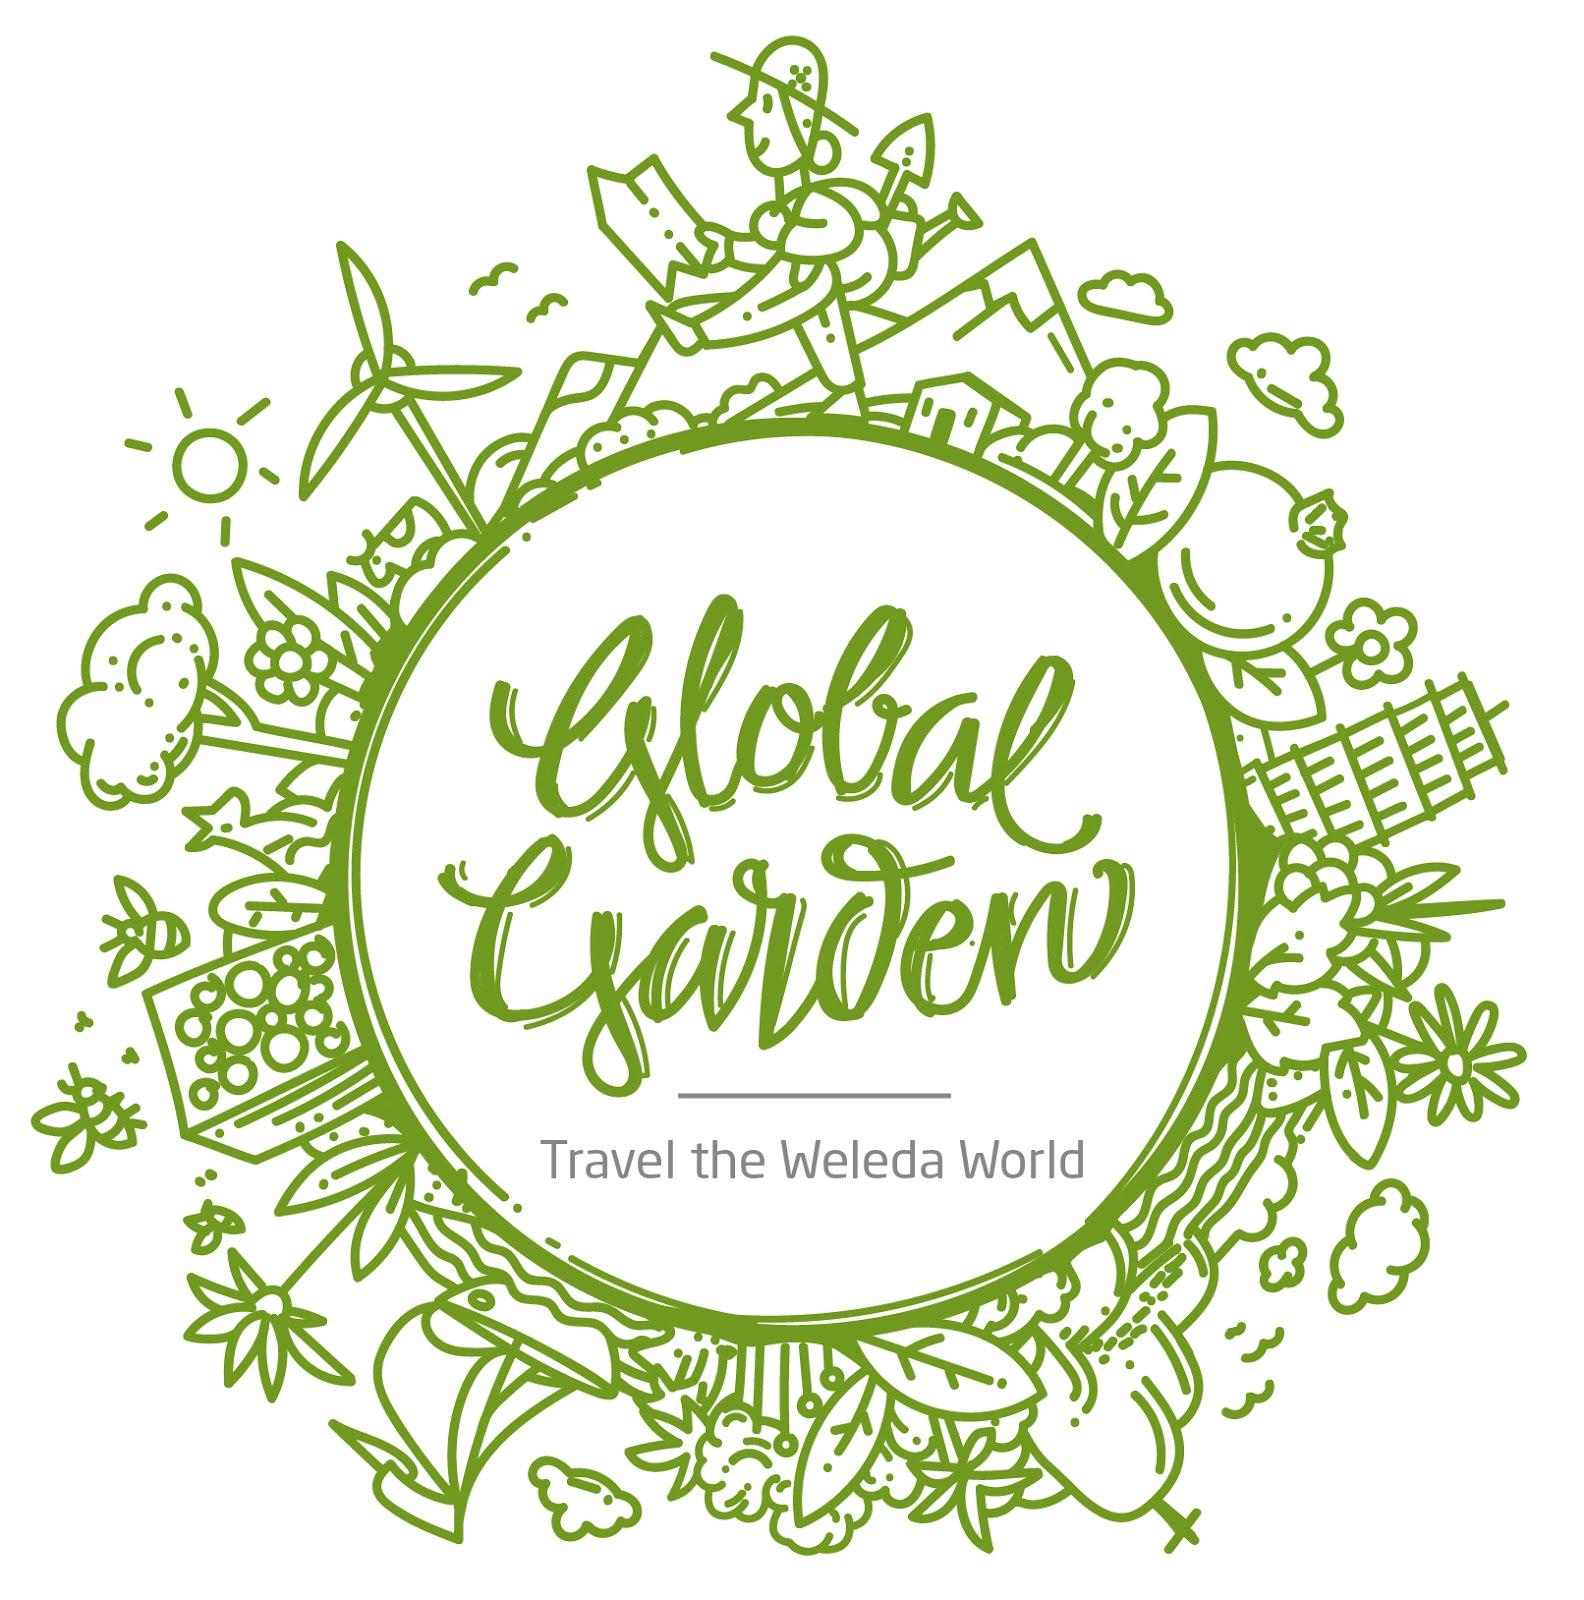 Soutěž Weleda Global Garden